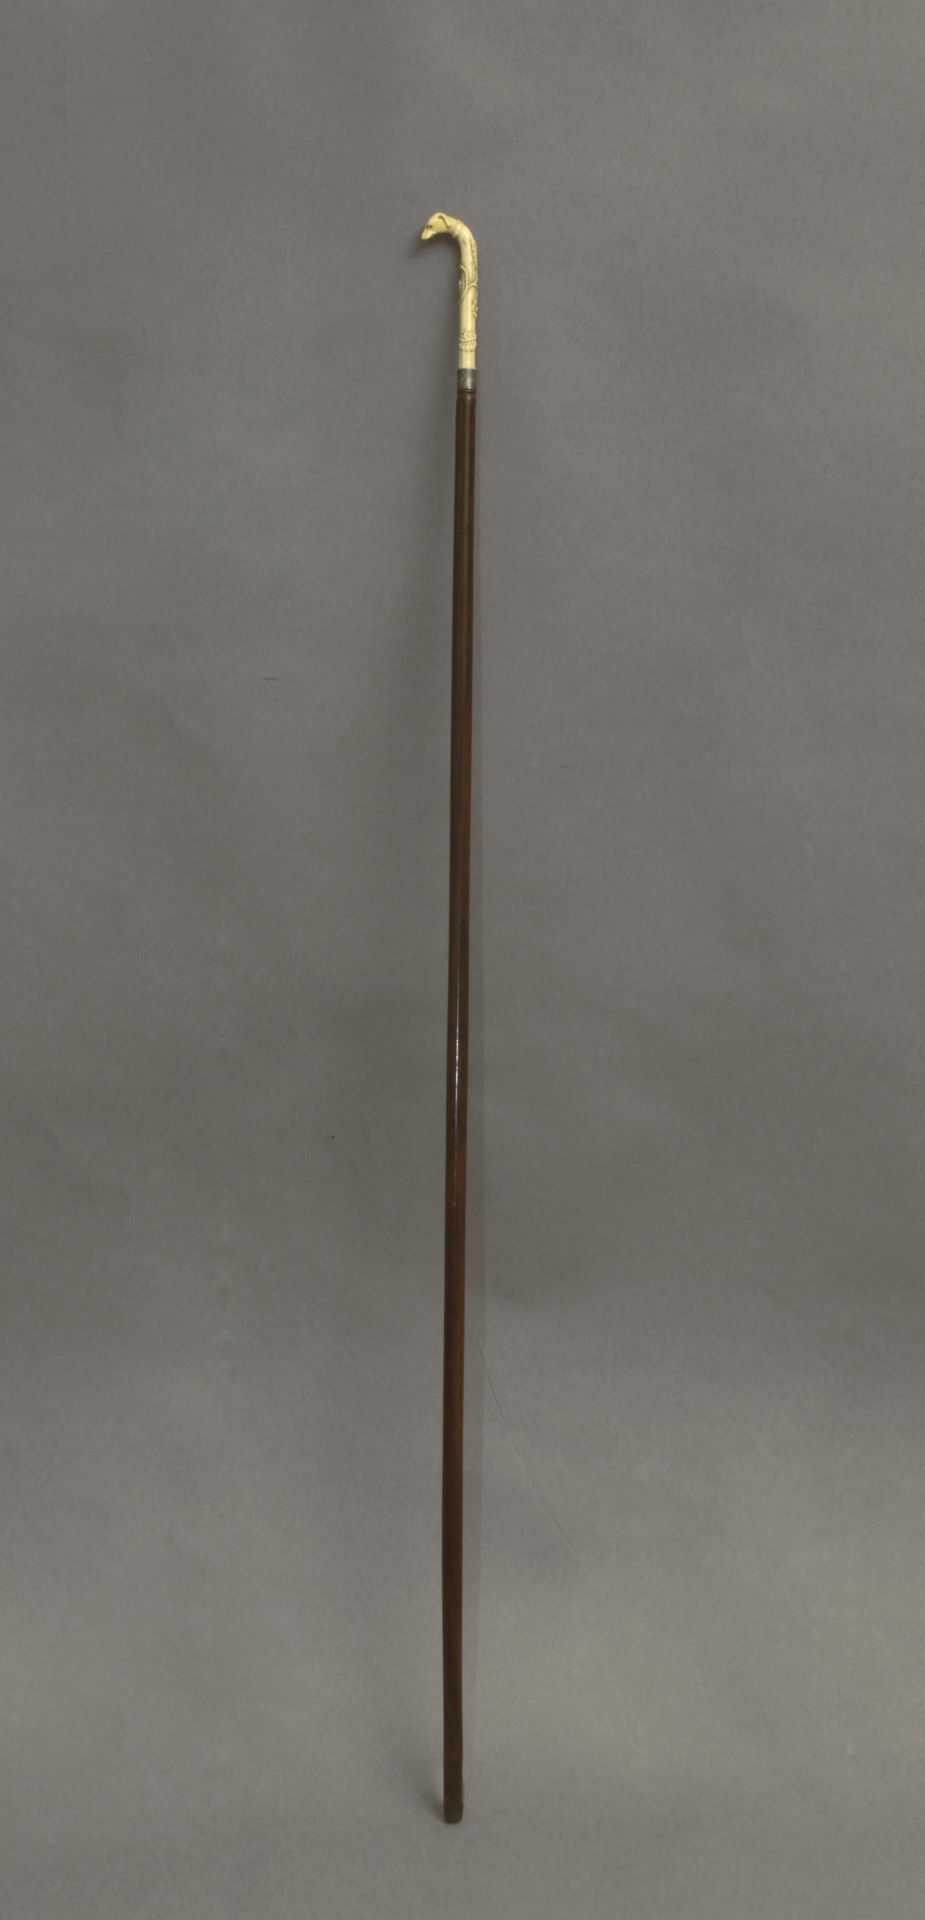 A 19th century probably English walking stick - Bild 2 aus 11